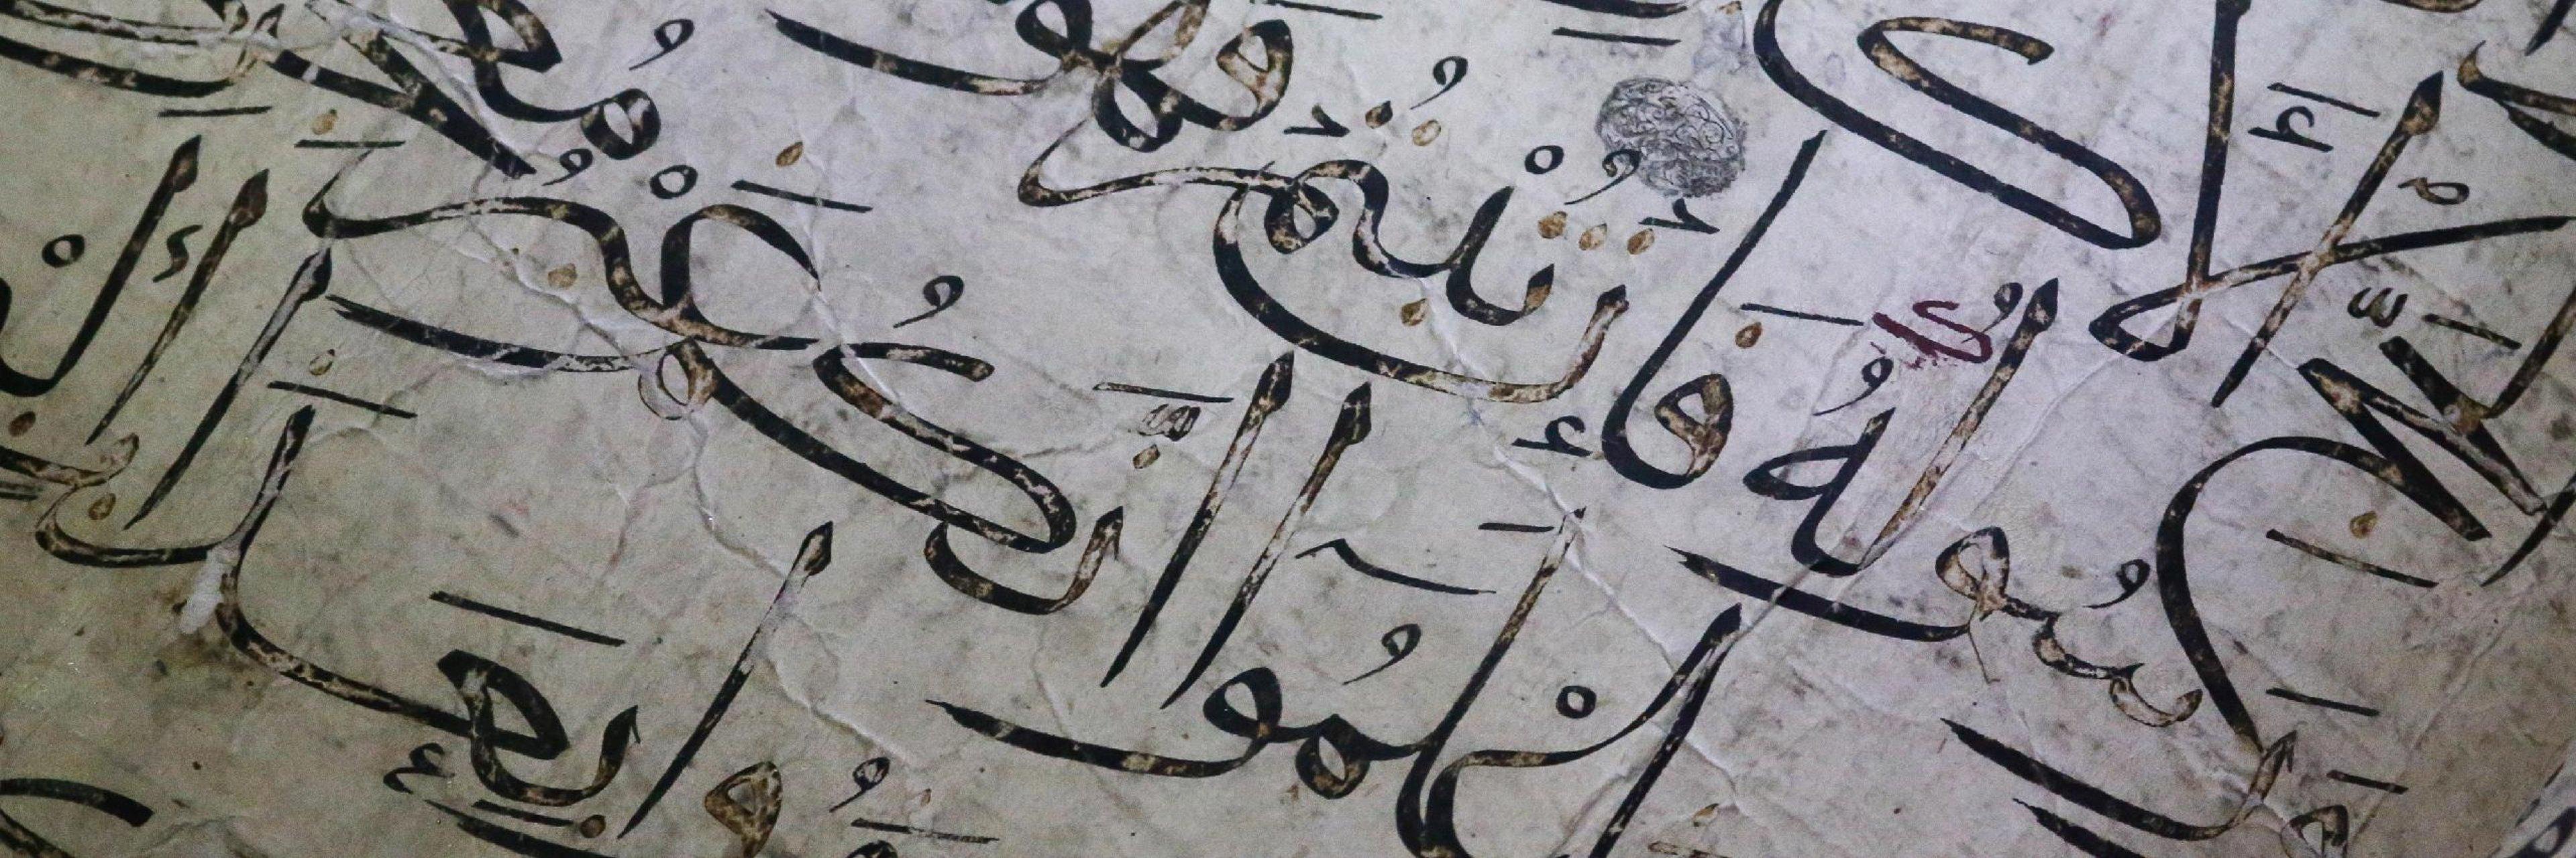 Introduction to I'jāz al-Qur'ān: The Role of Muhammad ﷺ